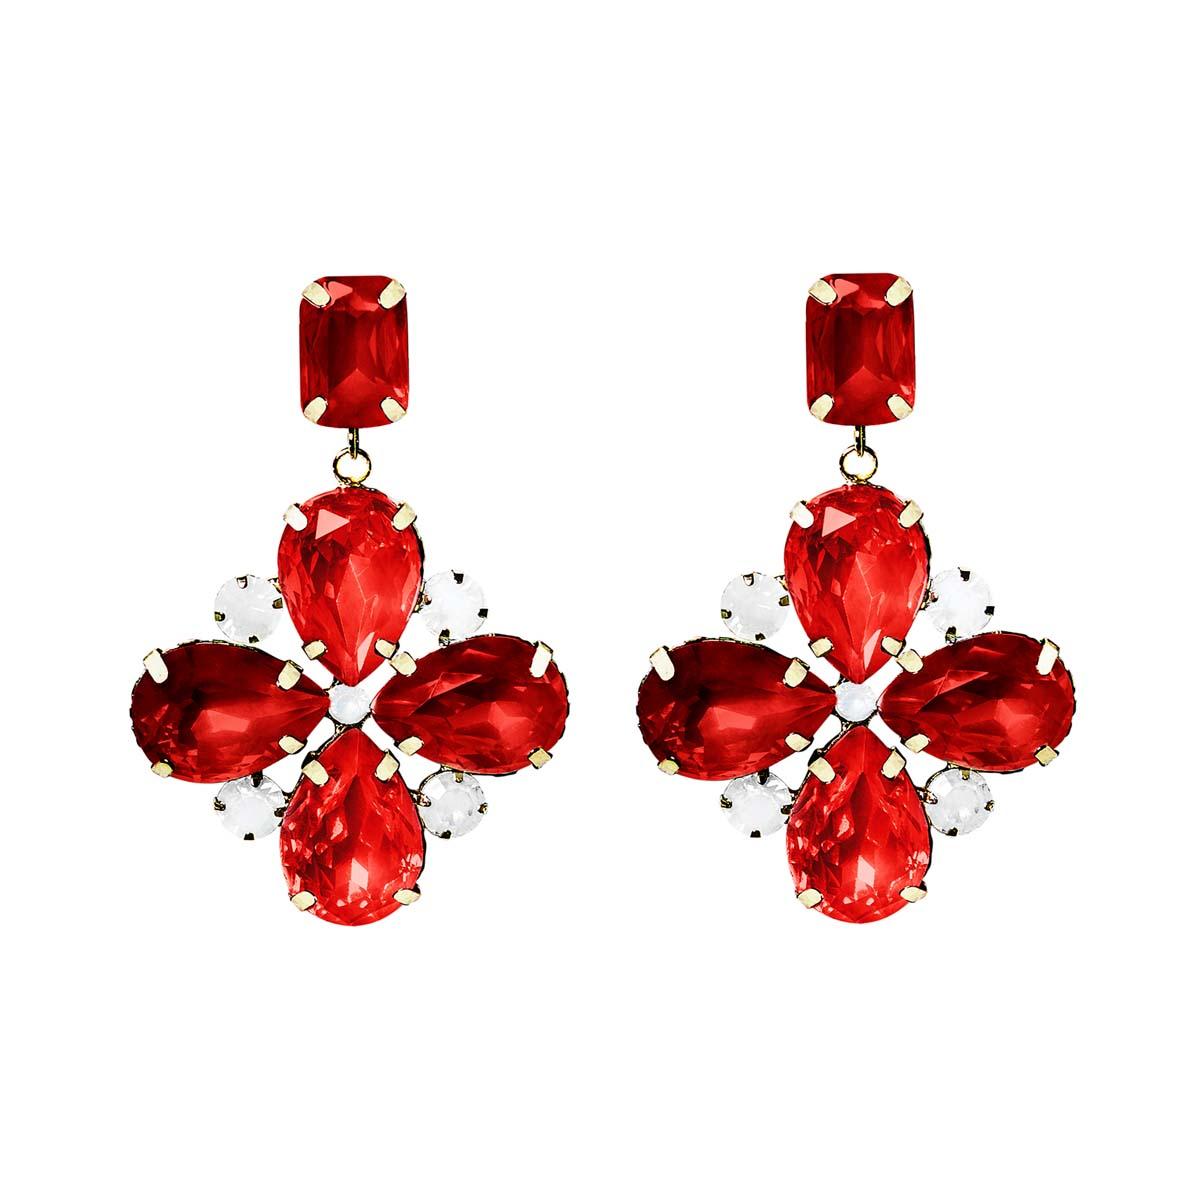 Teria Yabar - Pendientes semi largos de cristal rubí